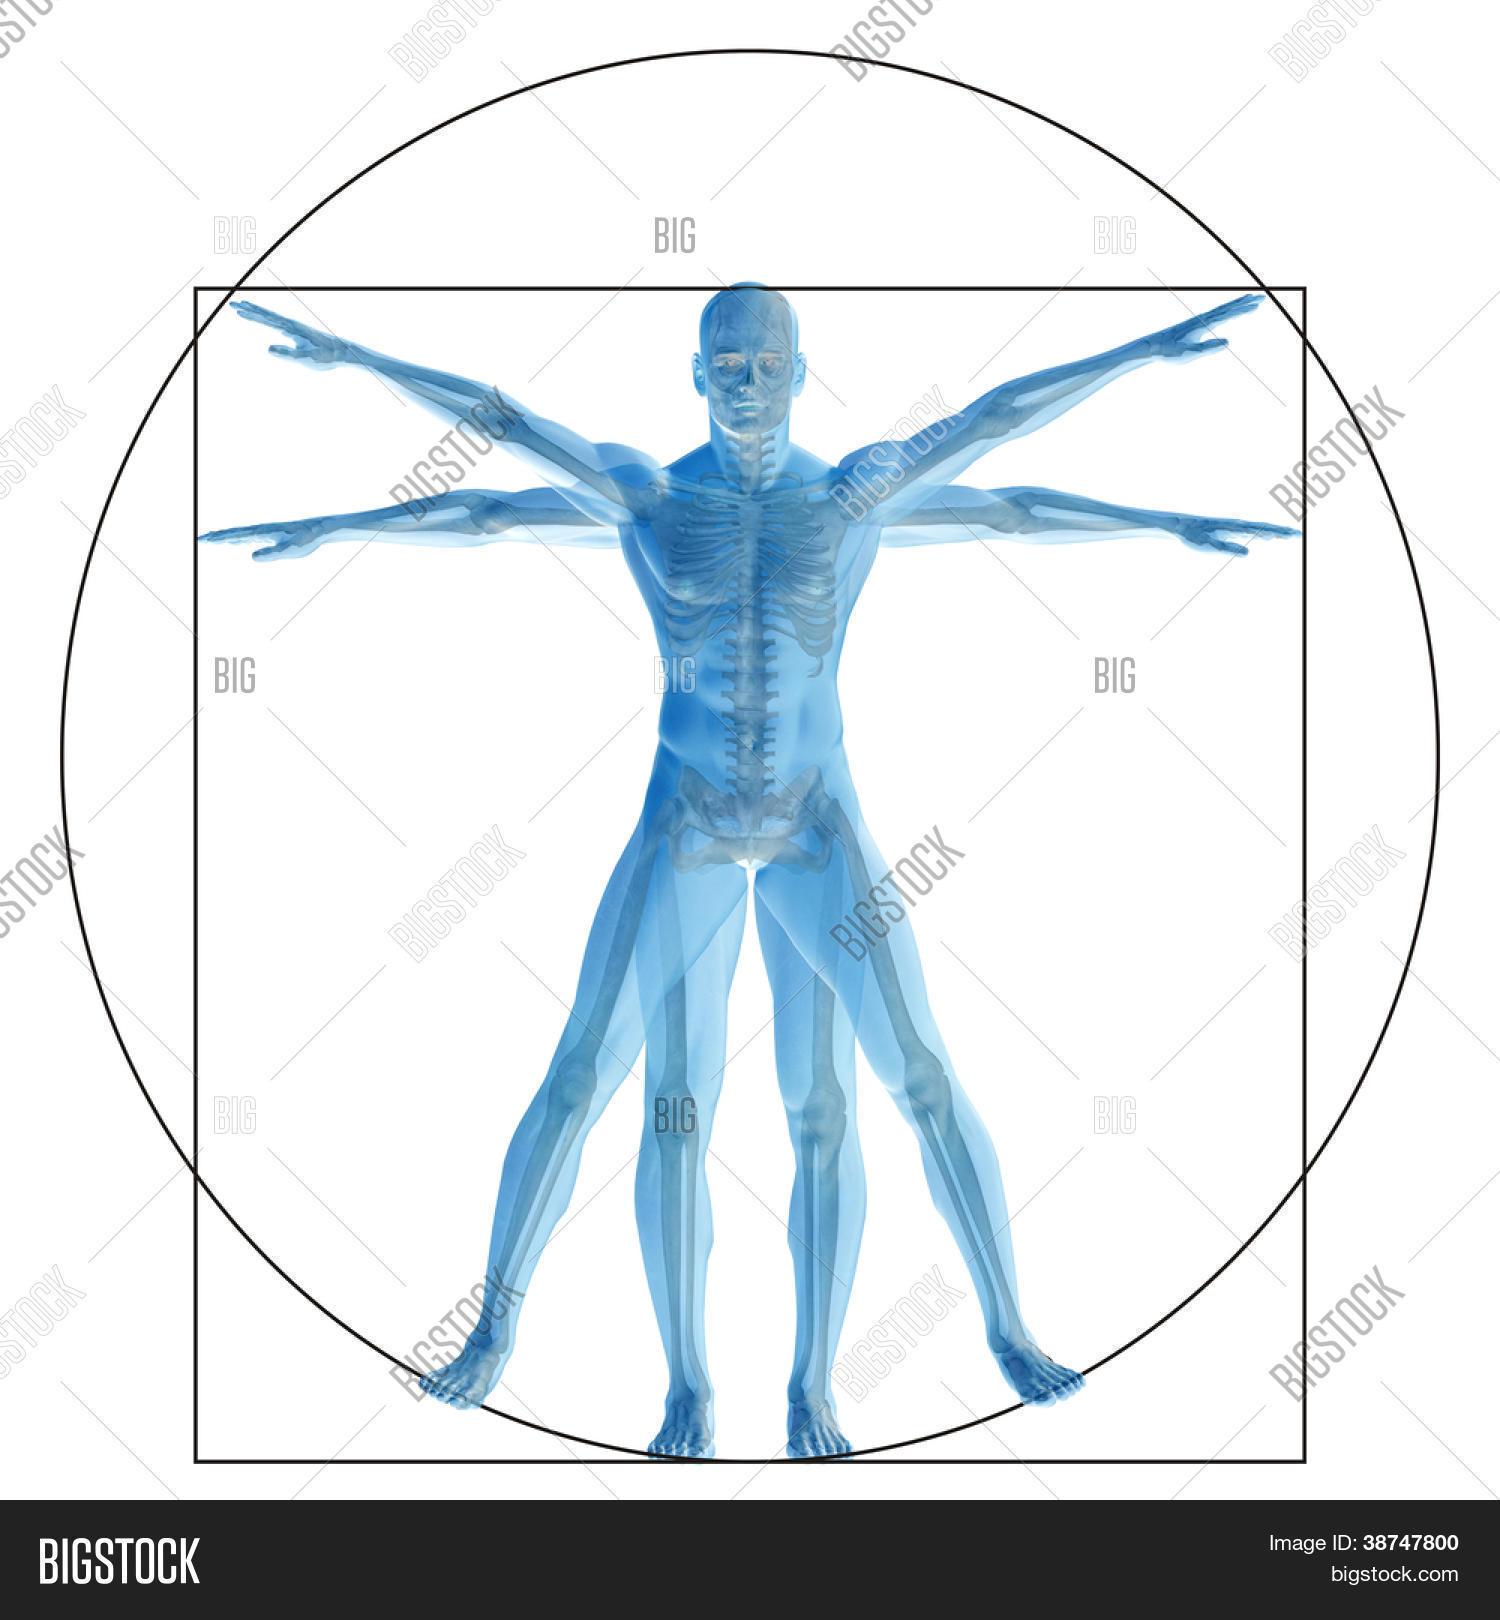 High Resolution Vitruvian Human Or Man As Conceptmetaphor Or